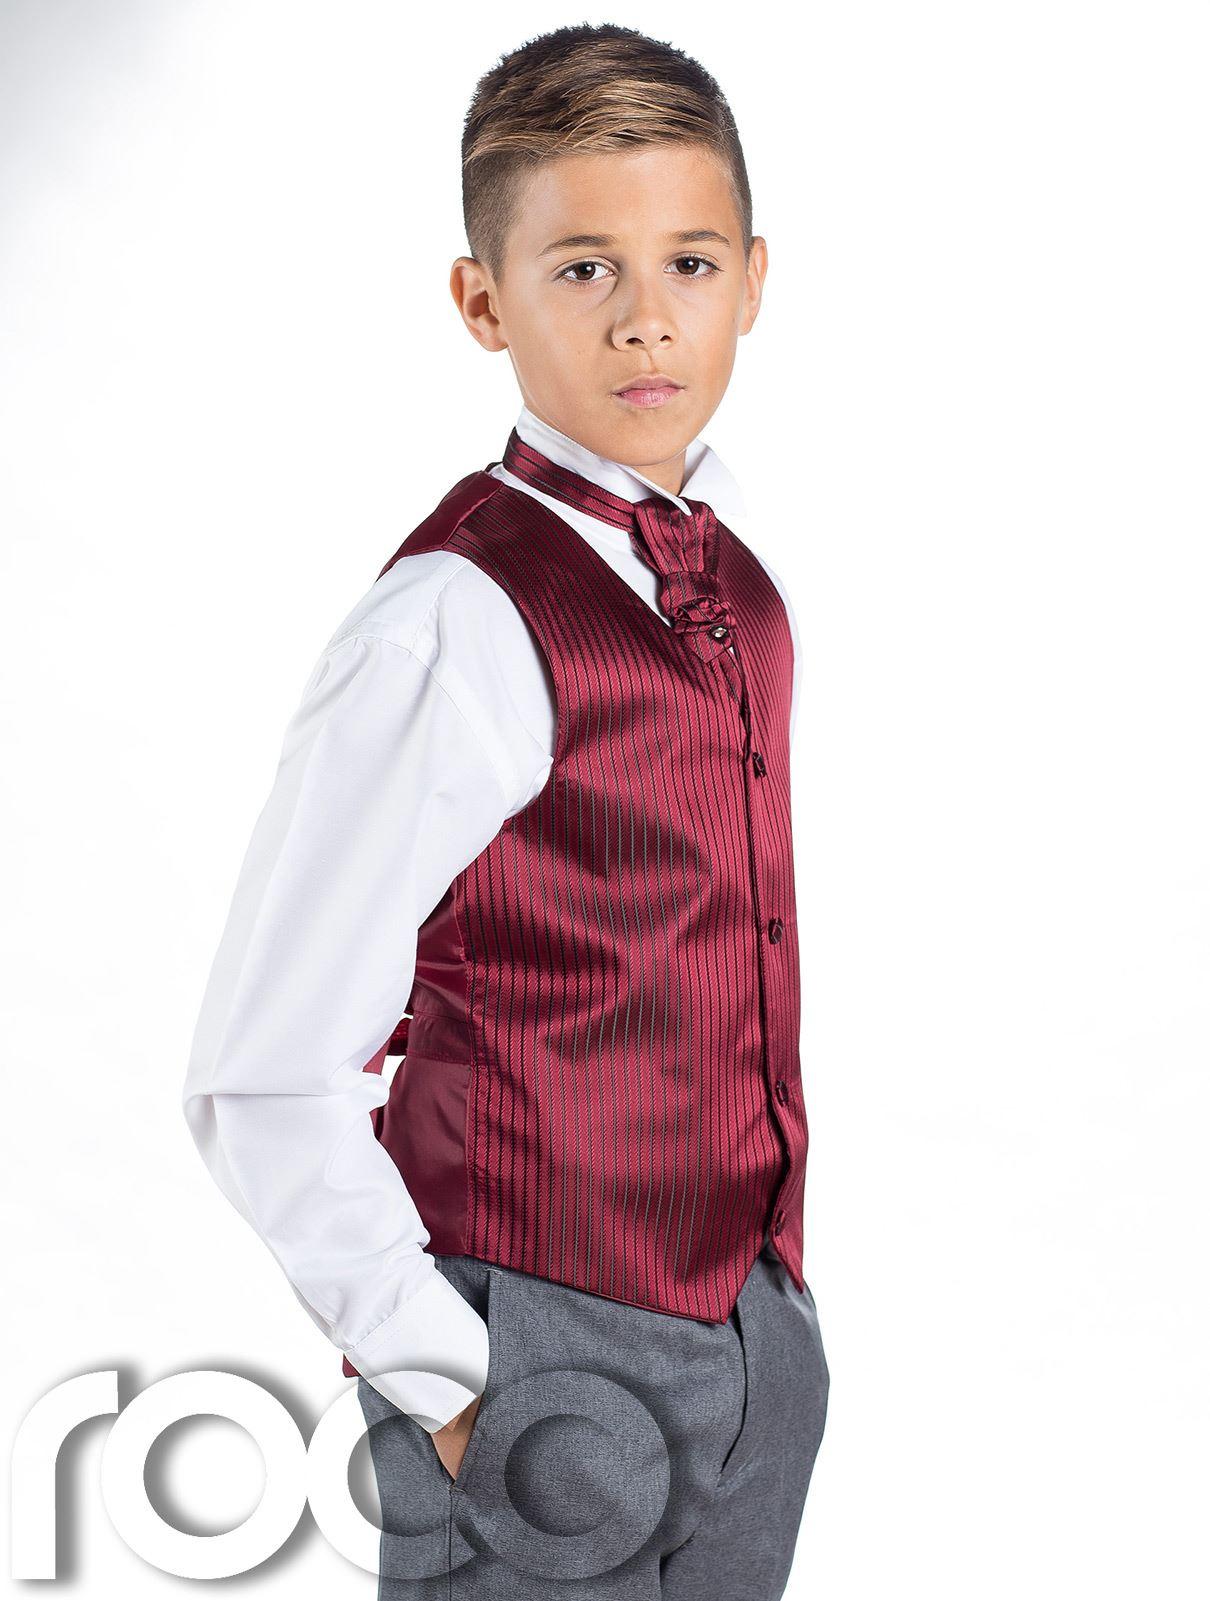 b7b6d0b82 Boys Striped Waistcoat   Cravat Suit Set With Grey Trousers